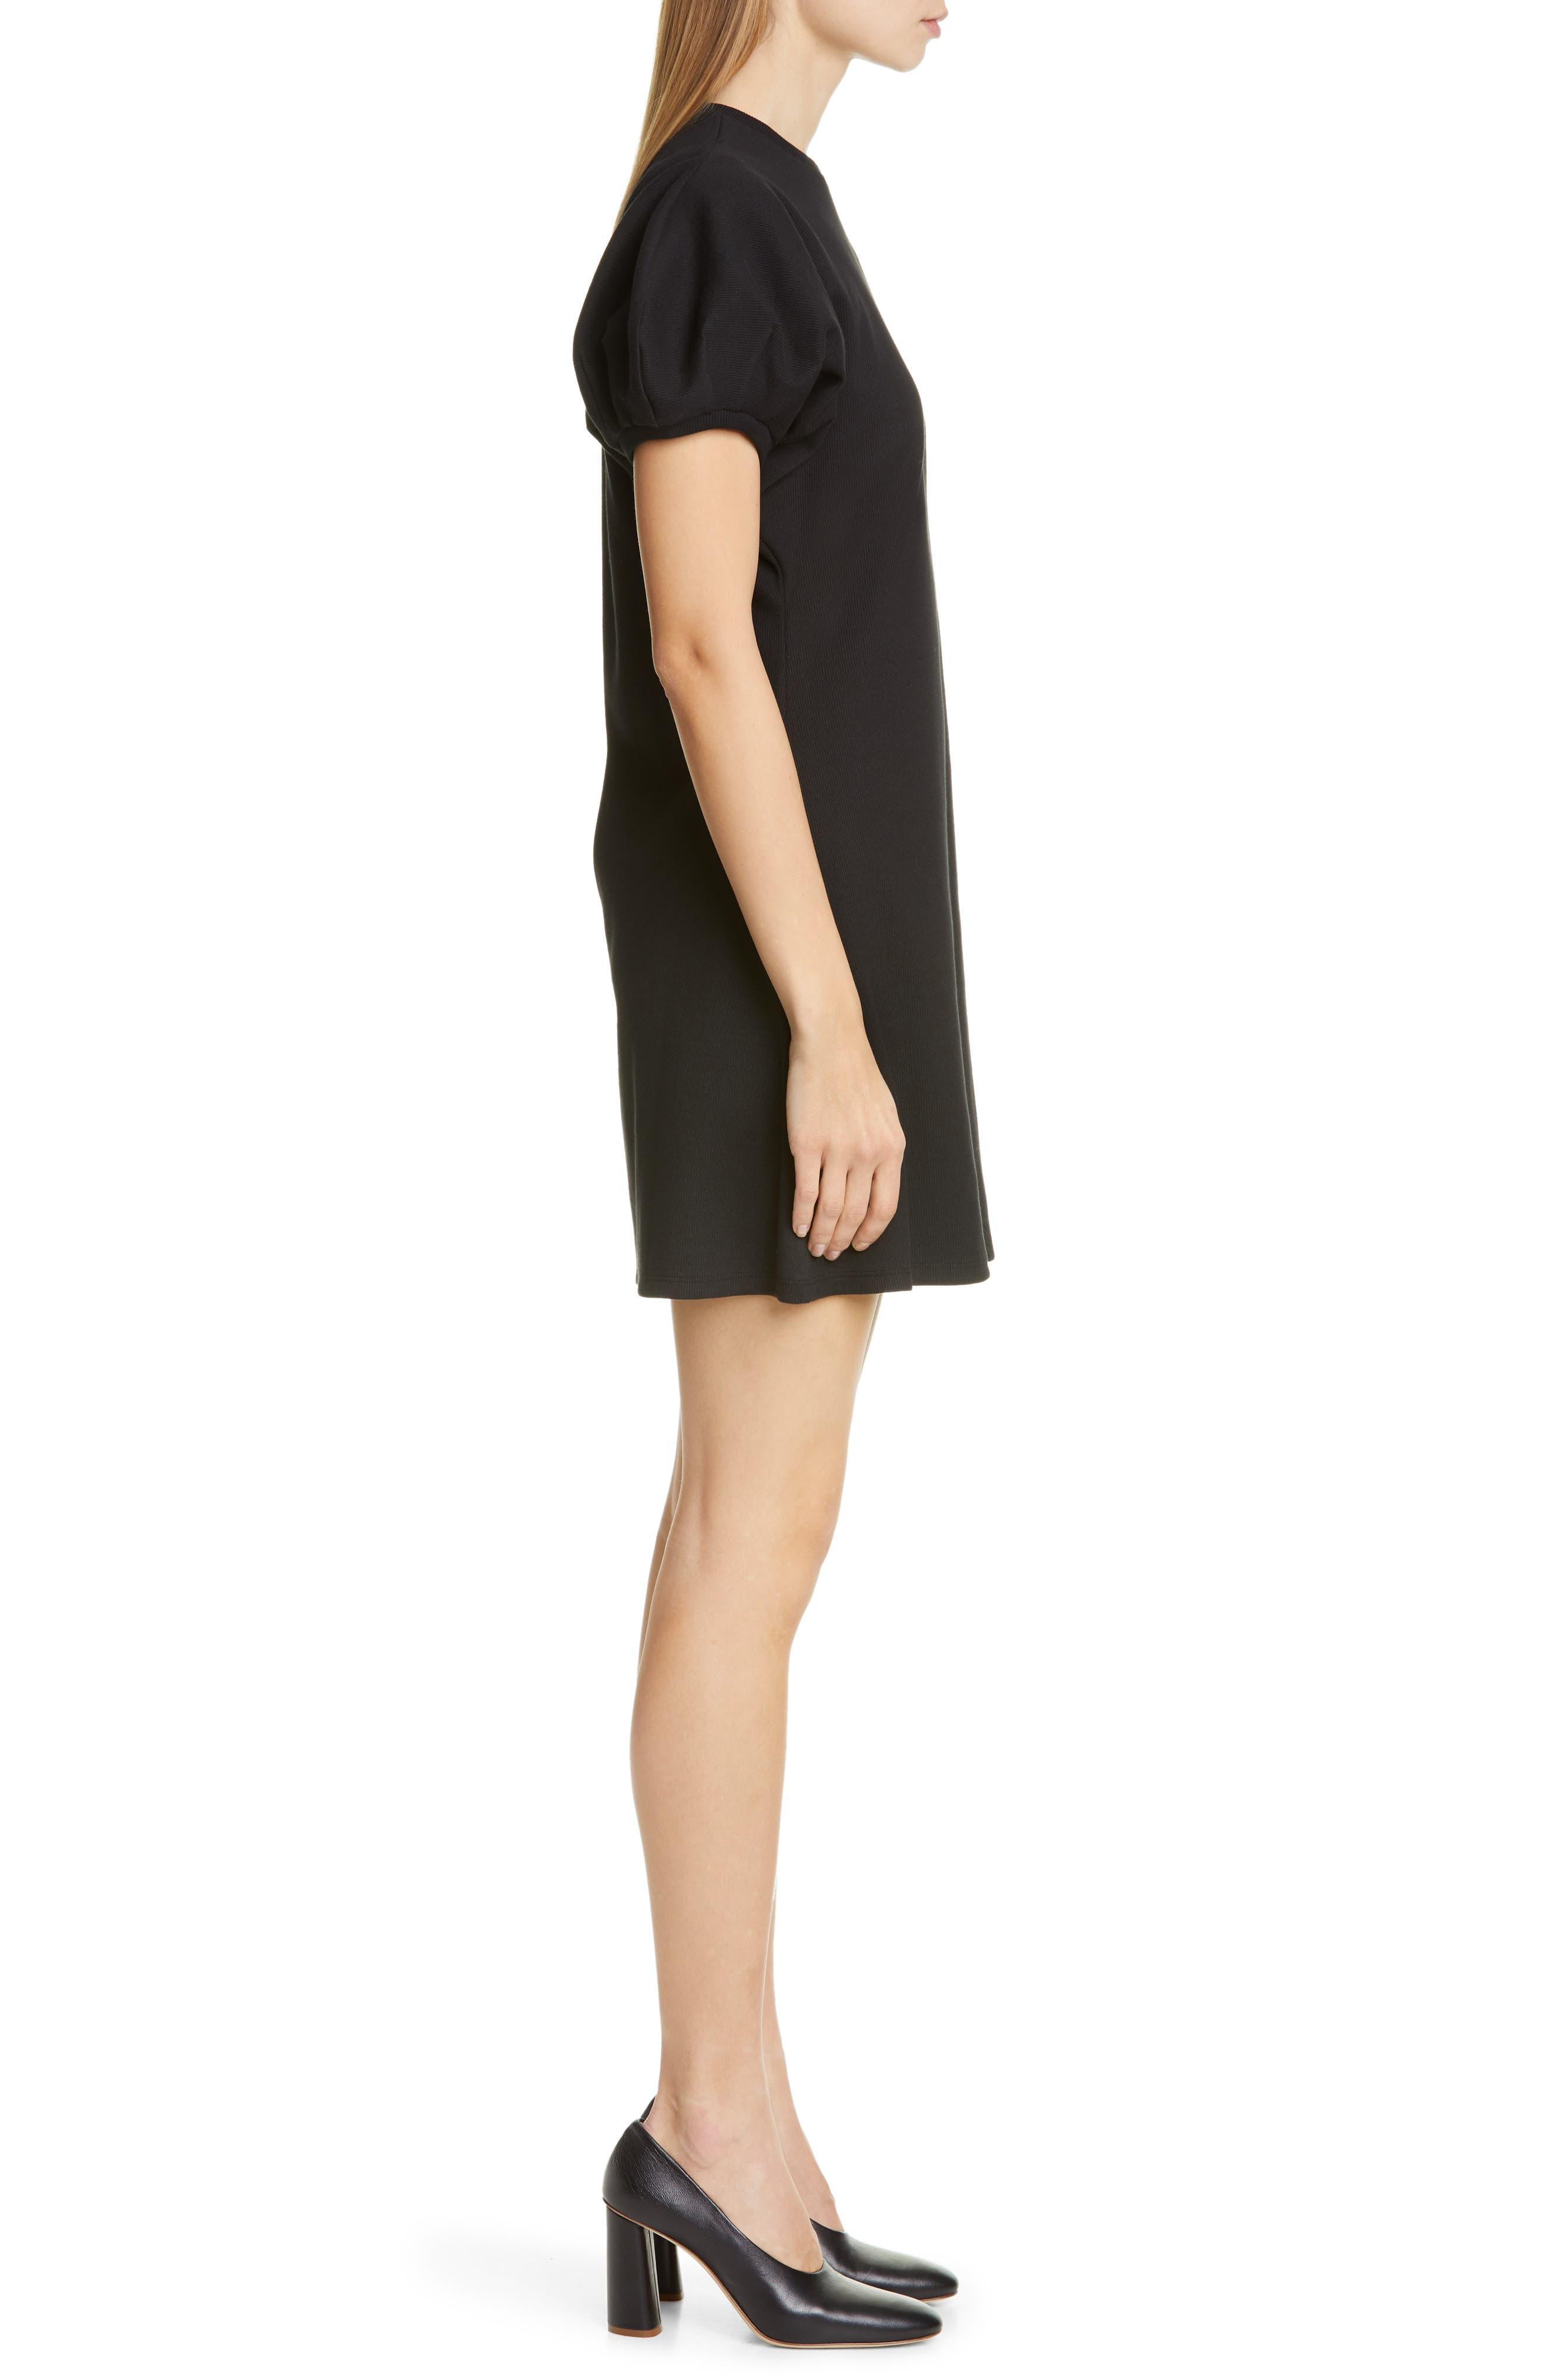 BEAUFILLE, Leda Puff Sleeve Dress, Alternate thumbnail 3, color, BLACK